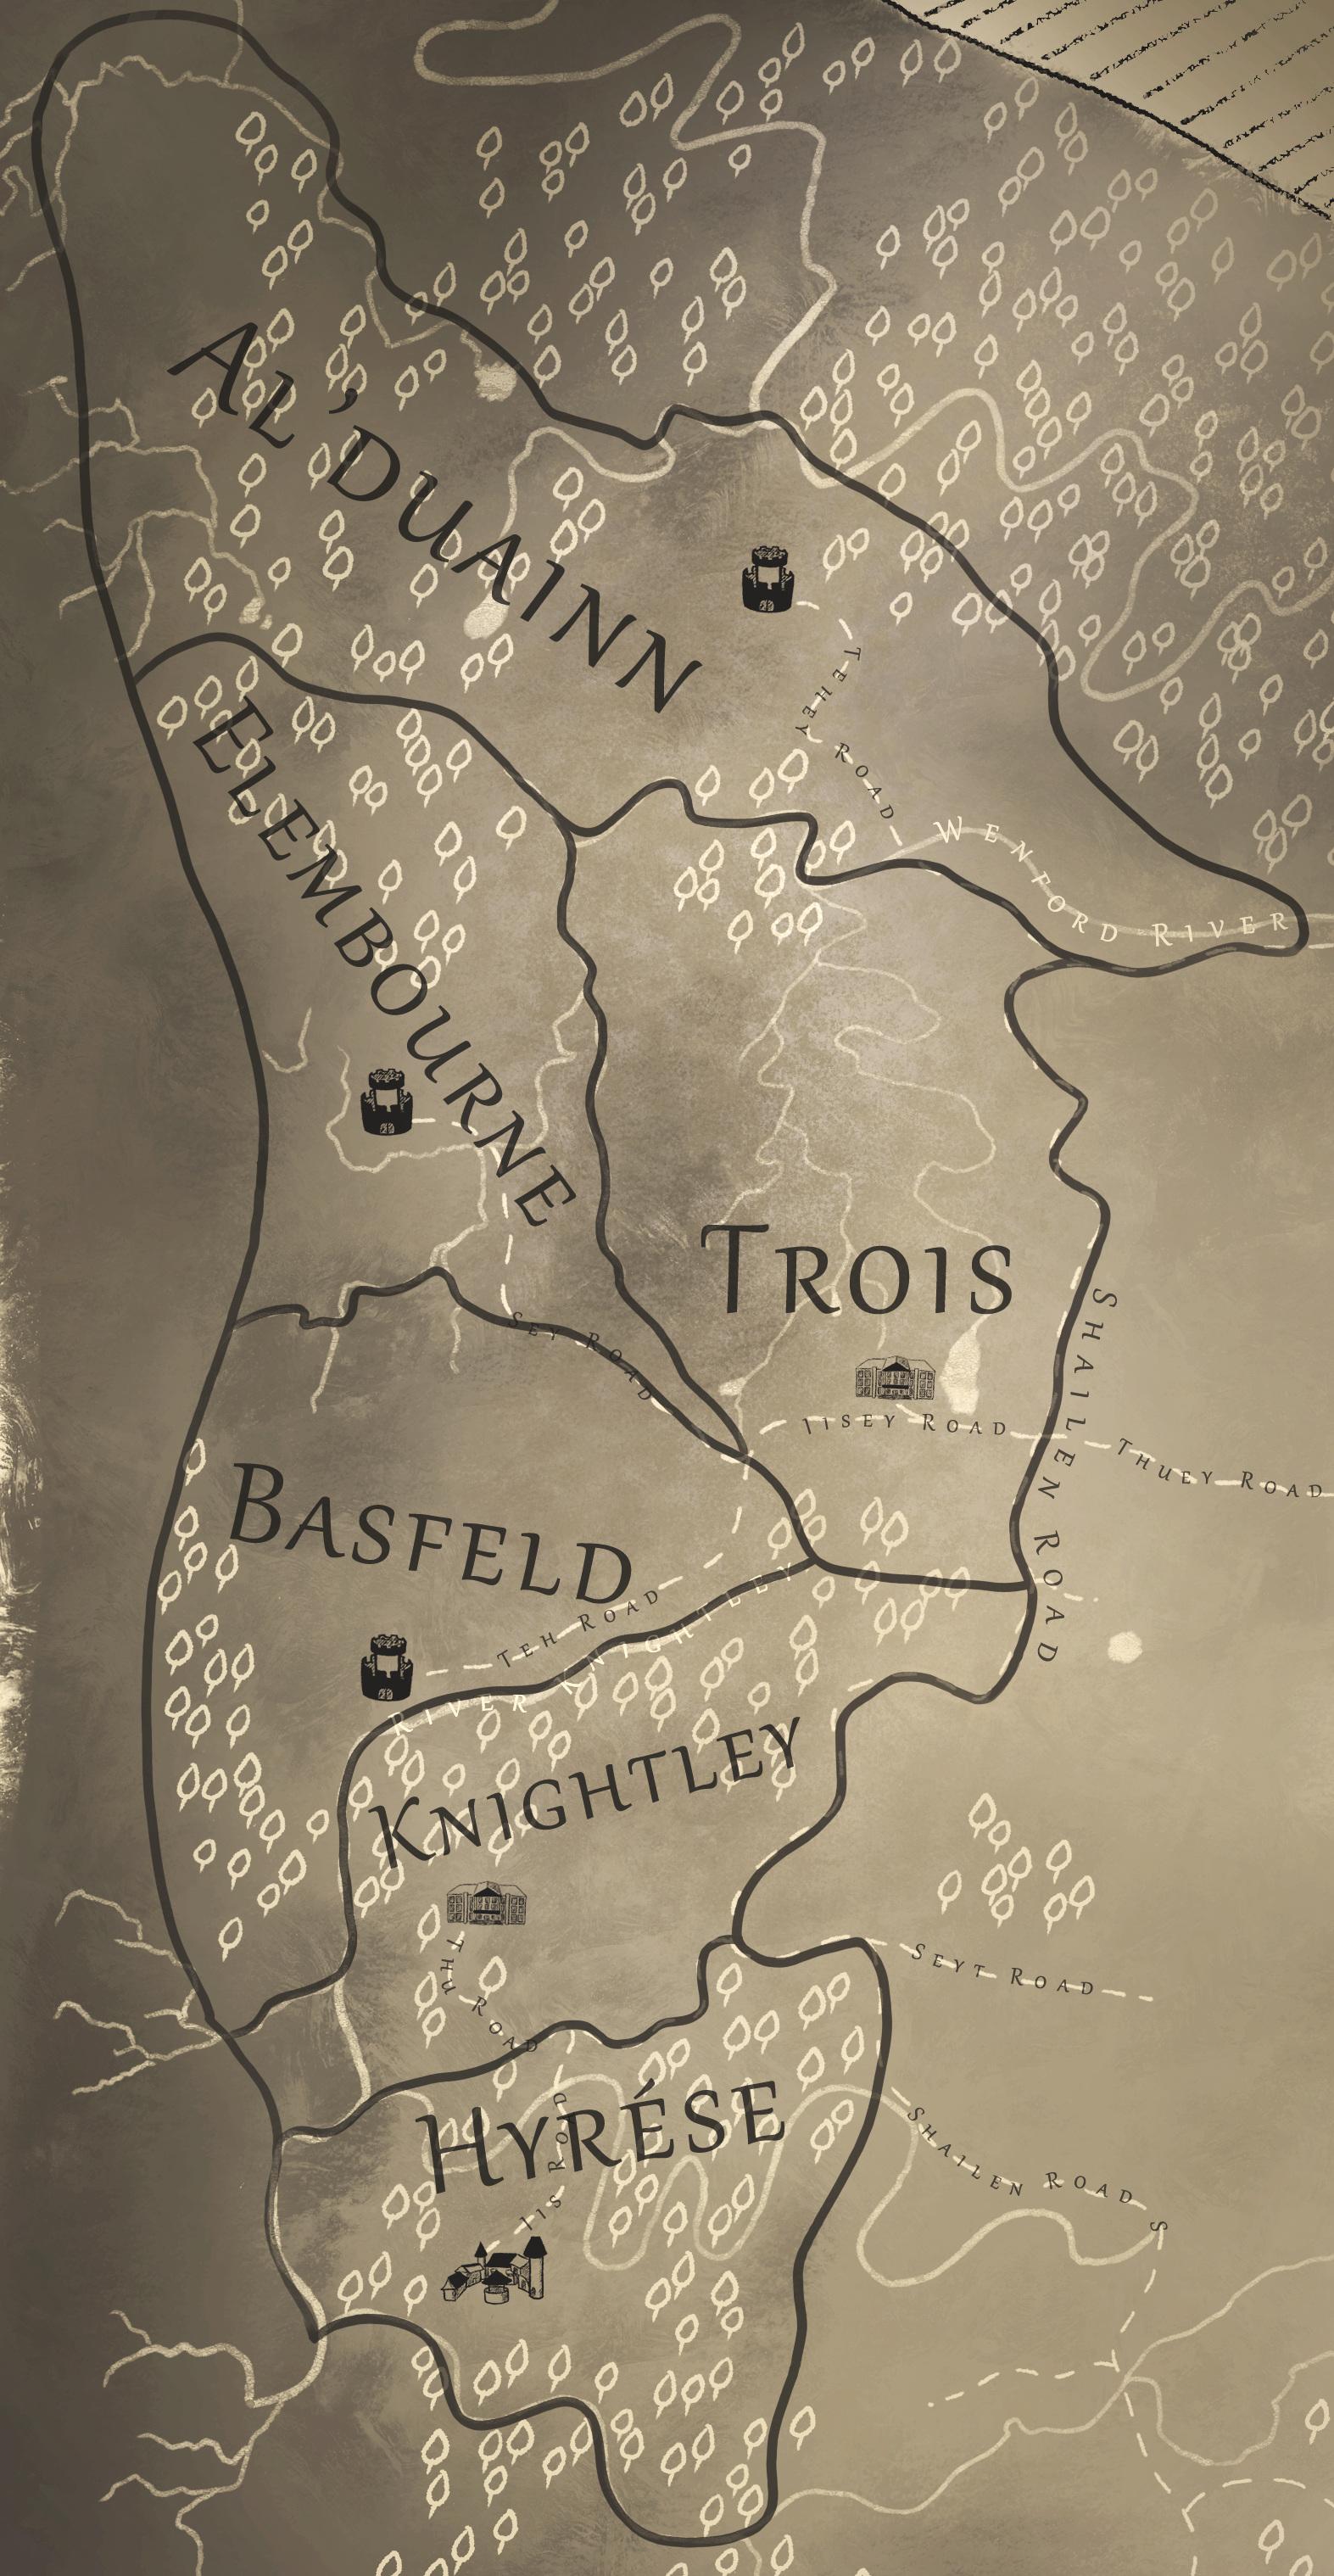 The Hyrése Estates of the Westingham Highlands, est. 8600